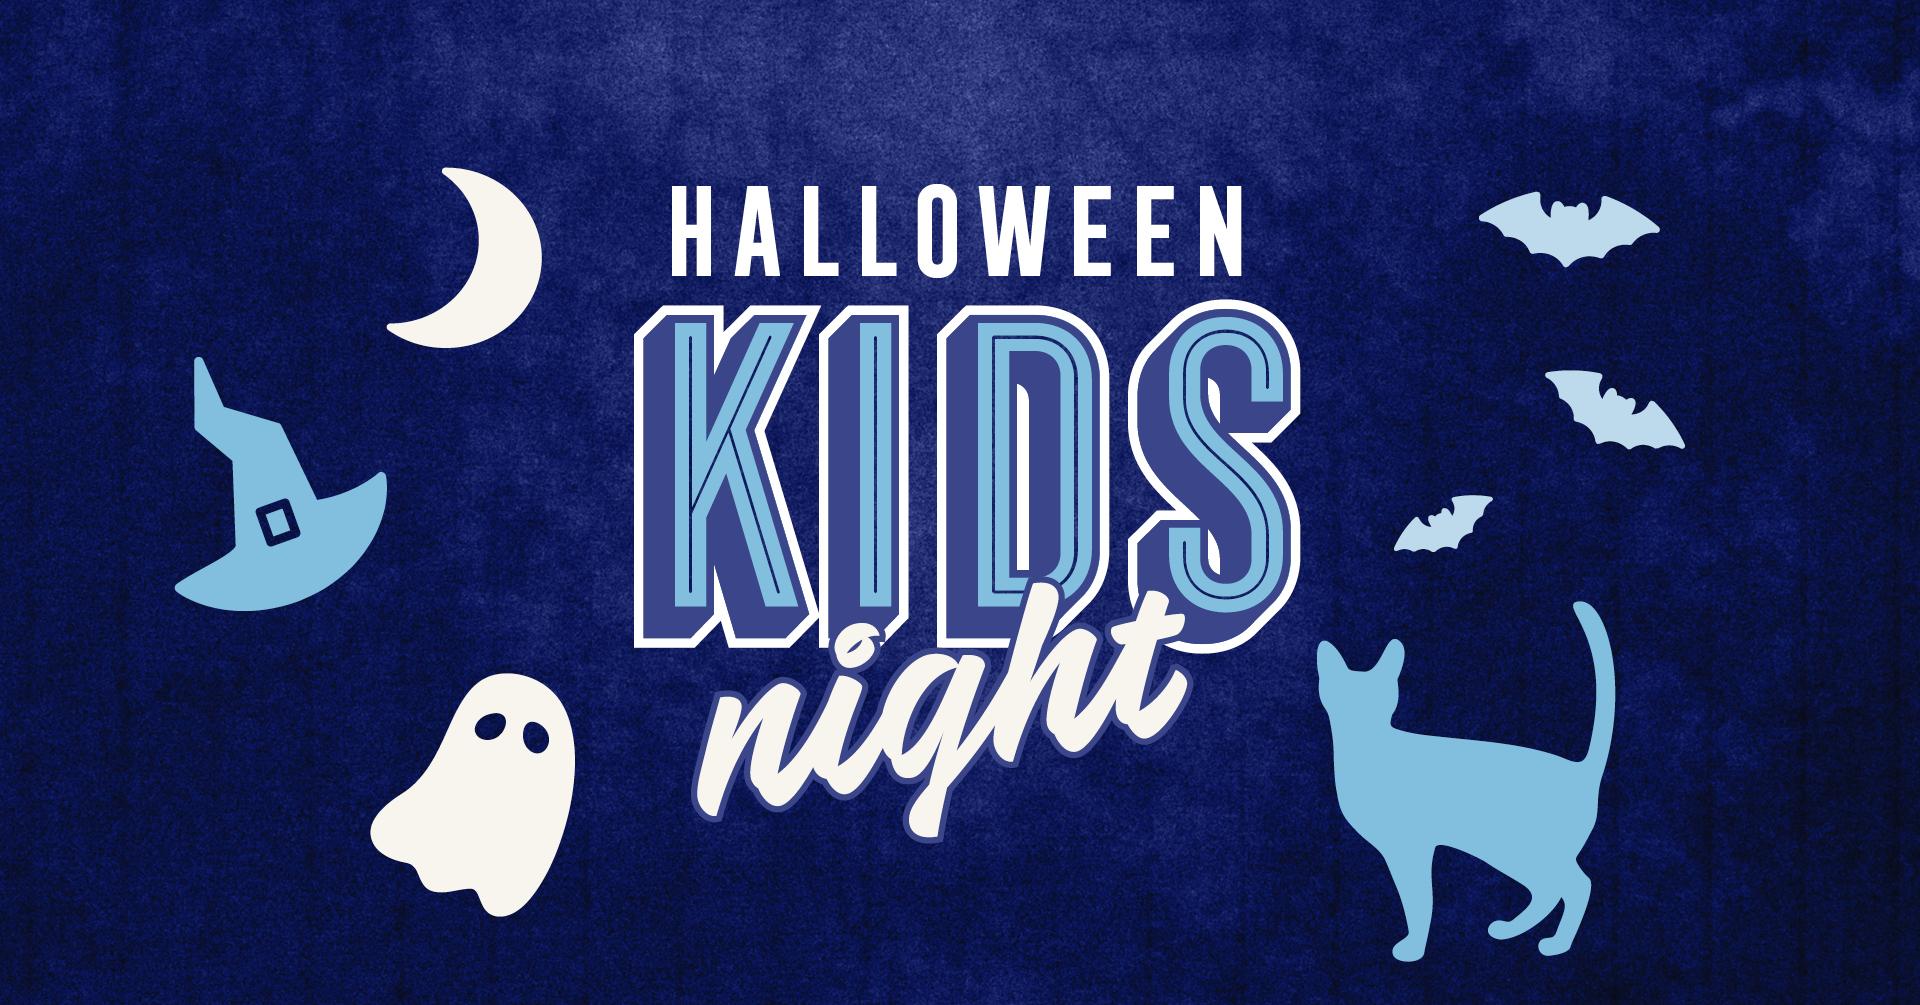 Halloween Kids Night 2021